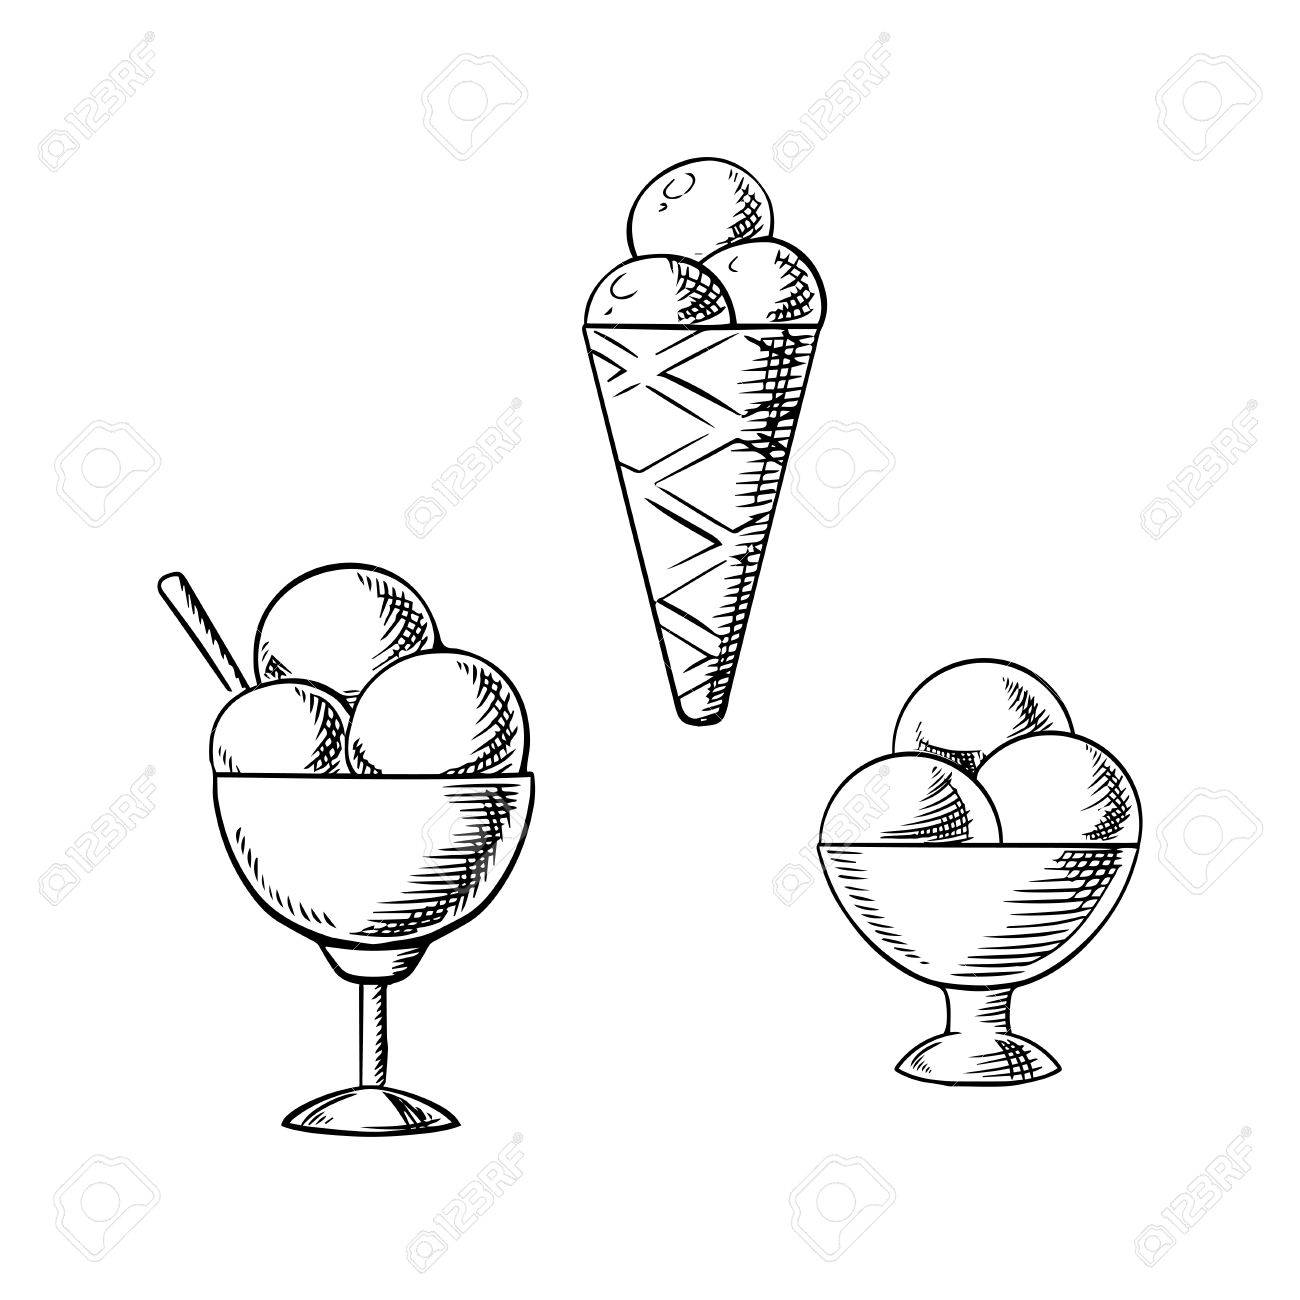 Ice Cream Scoop Drawing At Getdrawings